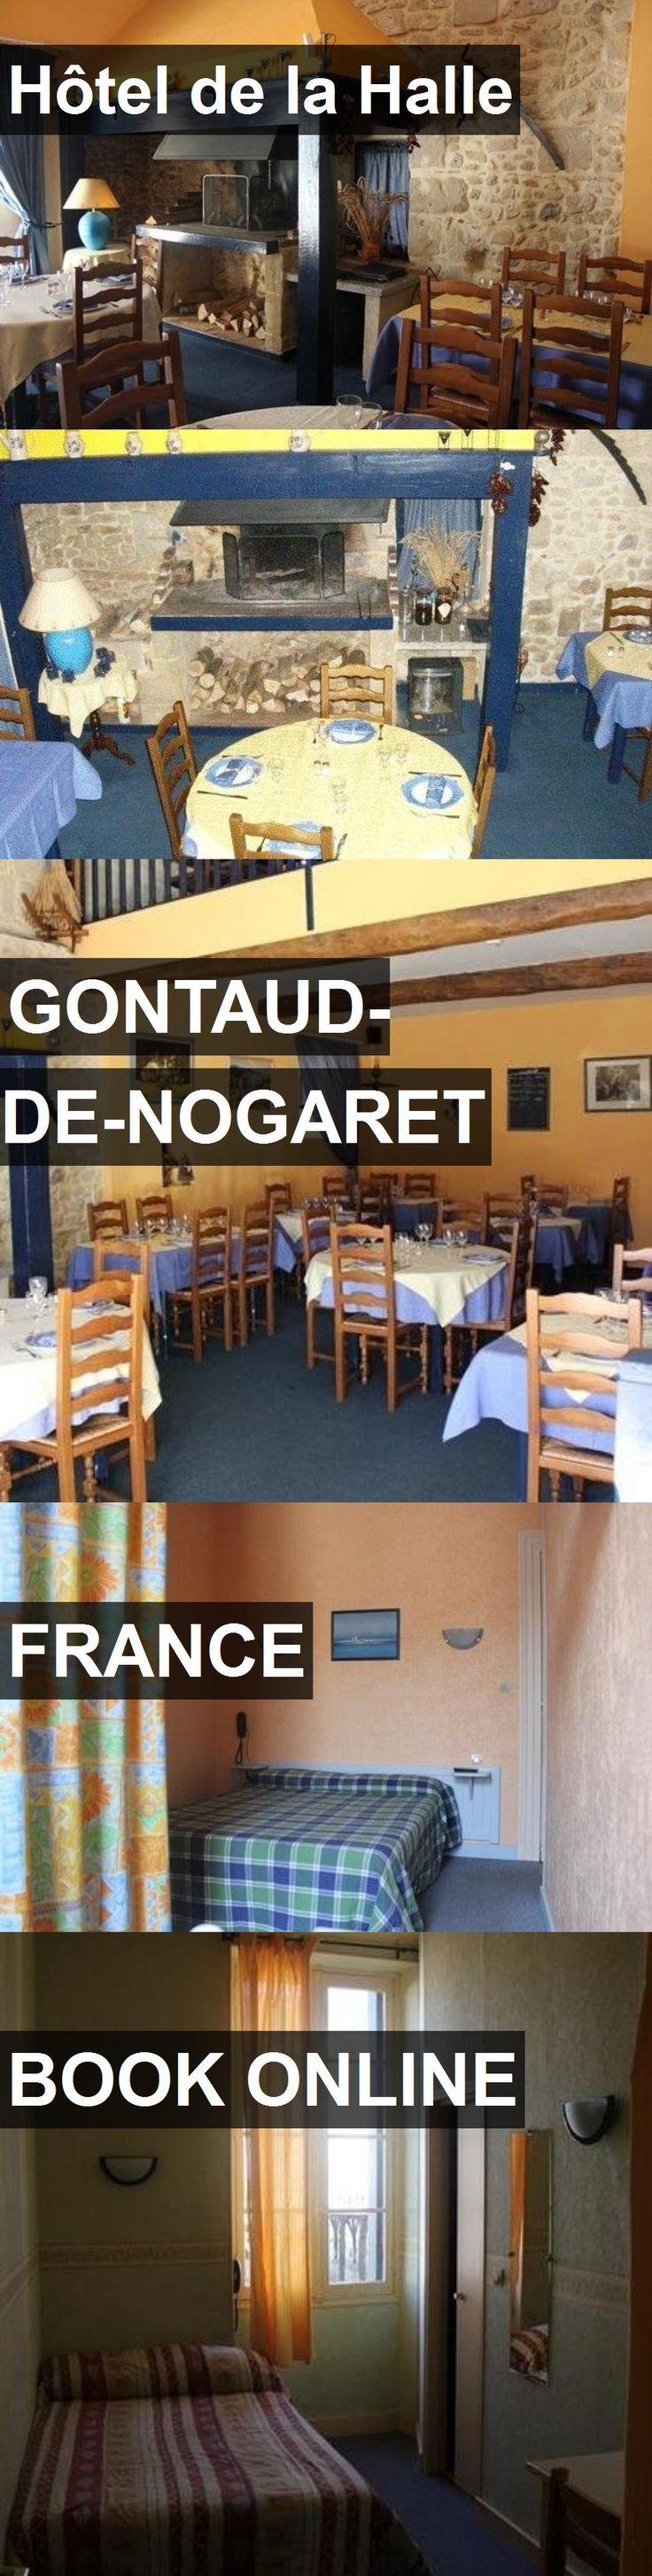 Hotel Hôtel de la Halle in Gontaud-de-Nogaret, France. For more information, photos, reviews and best prices please follow the link. #France #Gontaud-de-Nogaret #HôteldelaHalle #hotel #travel #vacation